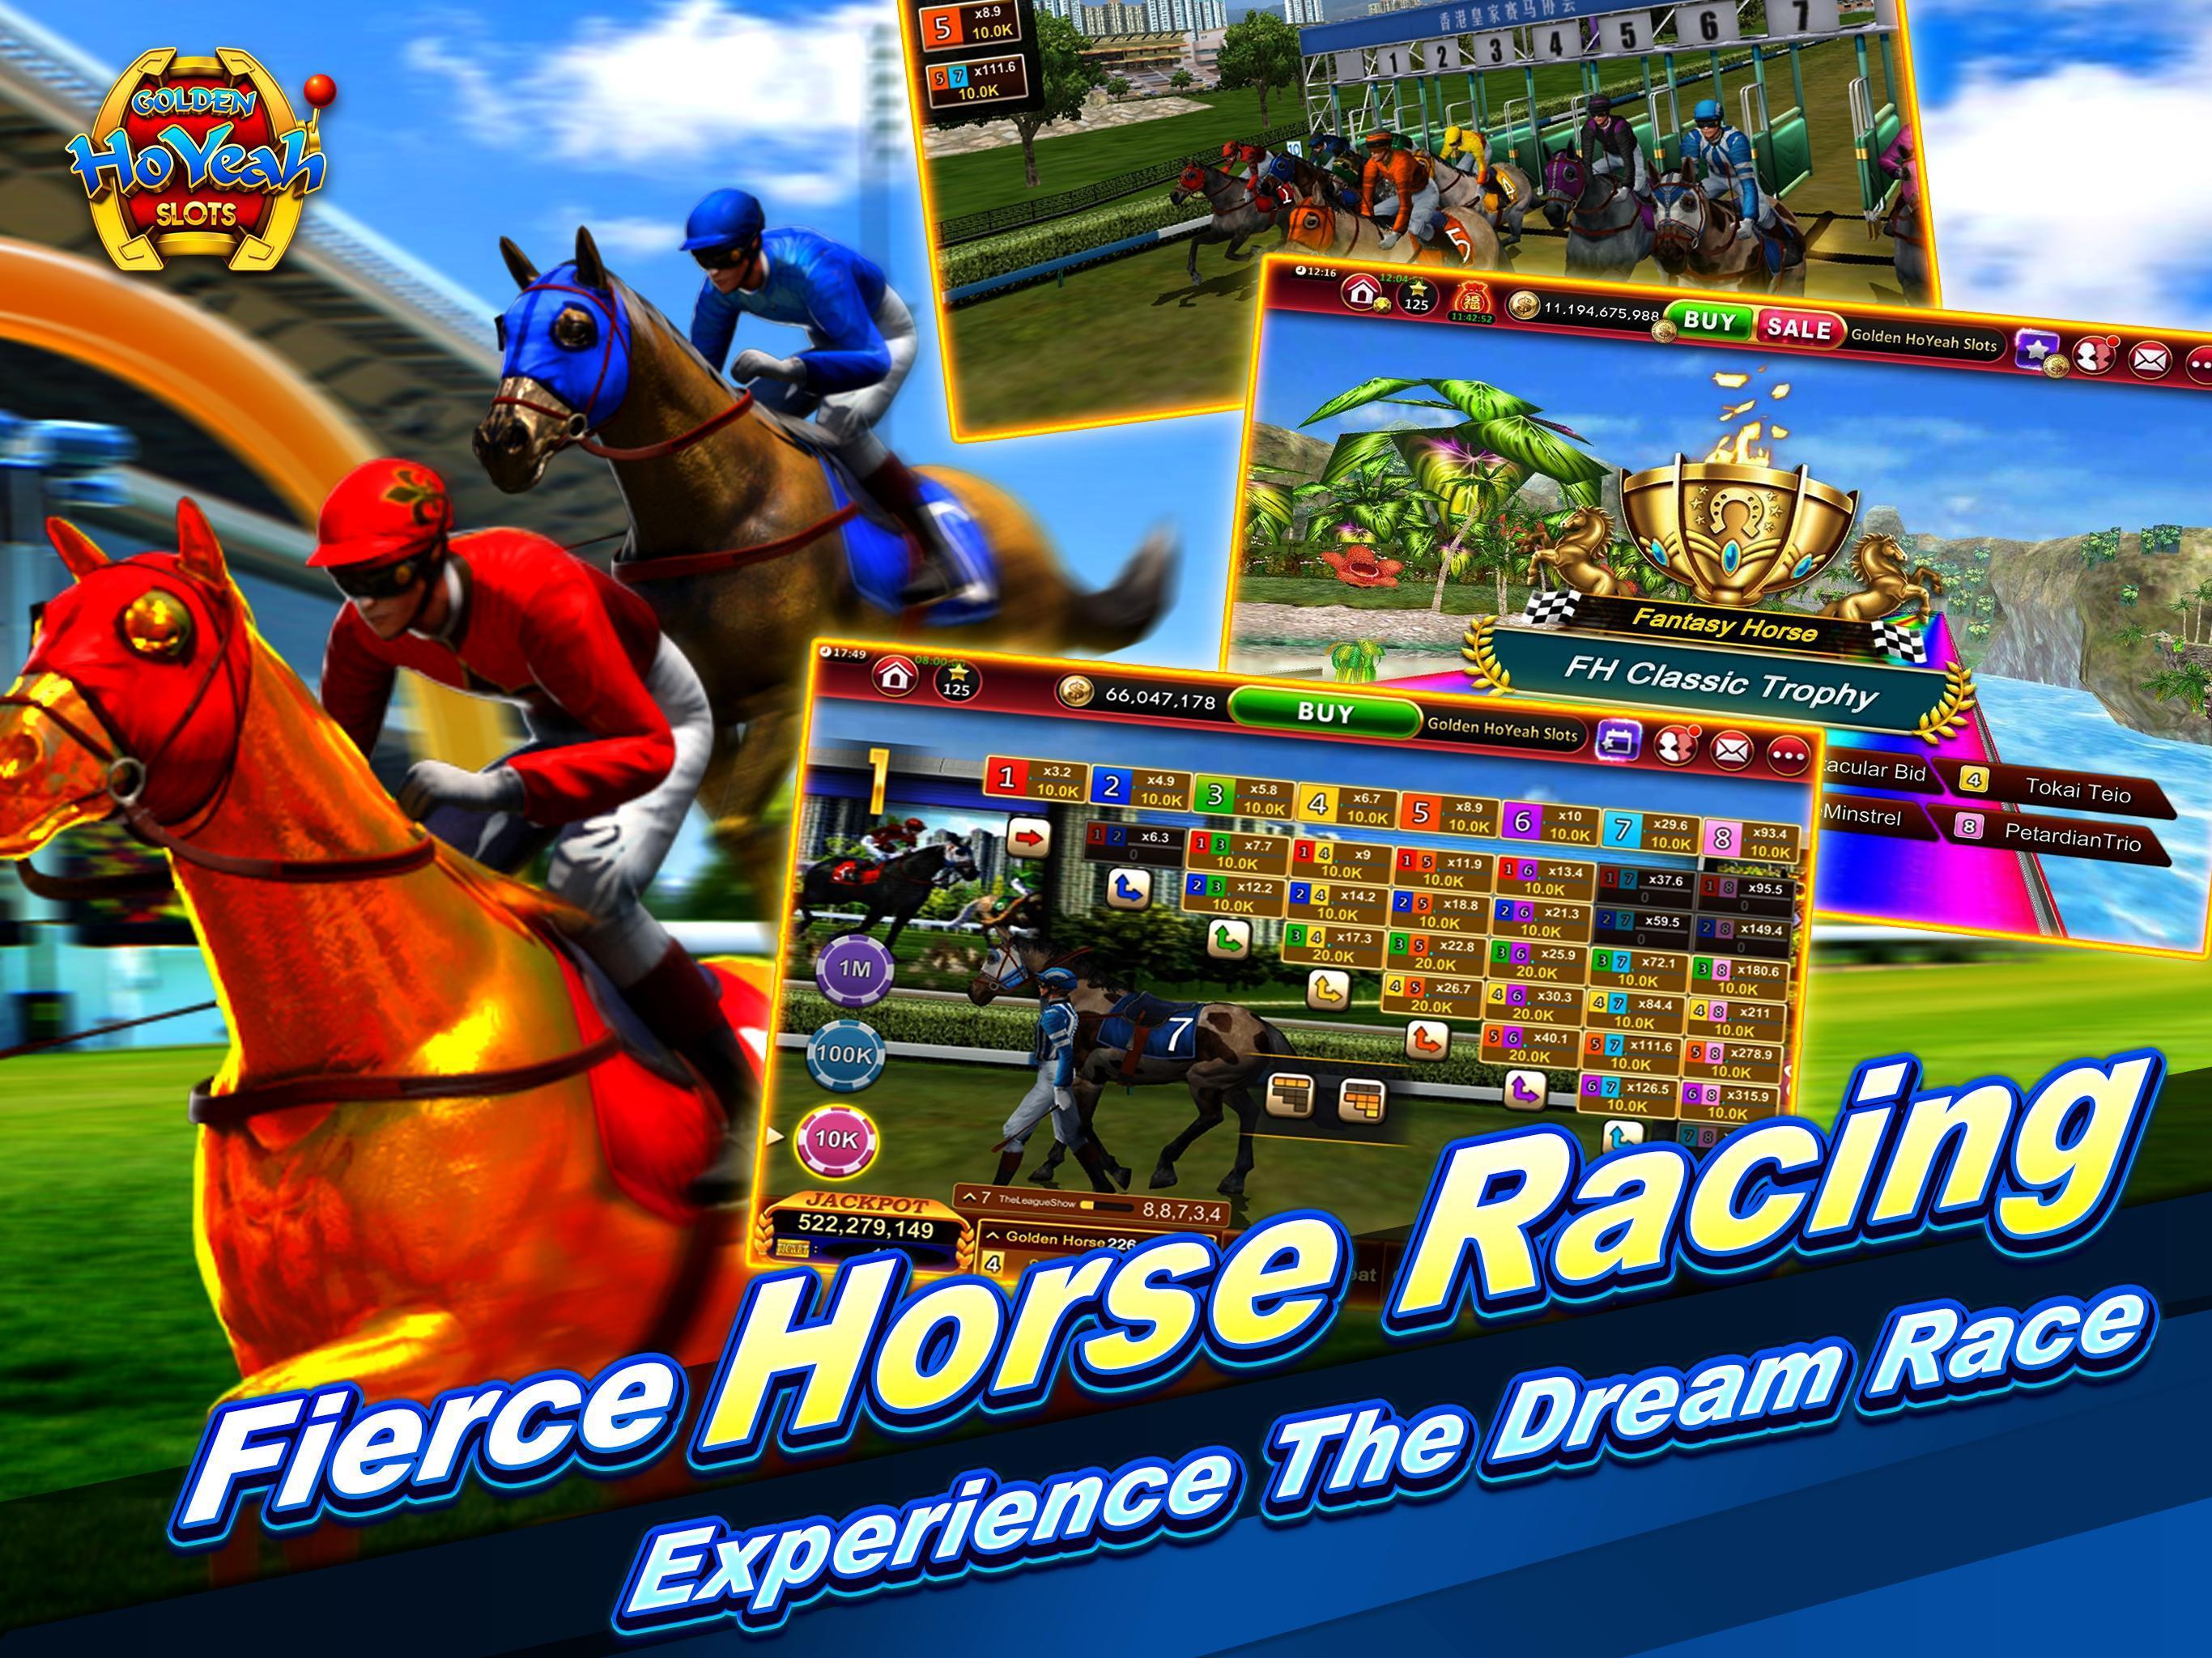 Slots (Golden HoYeah) - Casino Slots 2.5.7 Screenshot 14